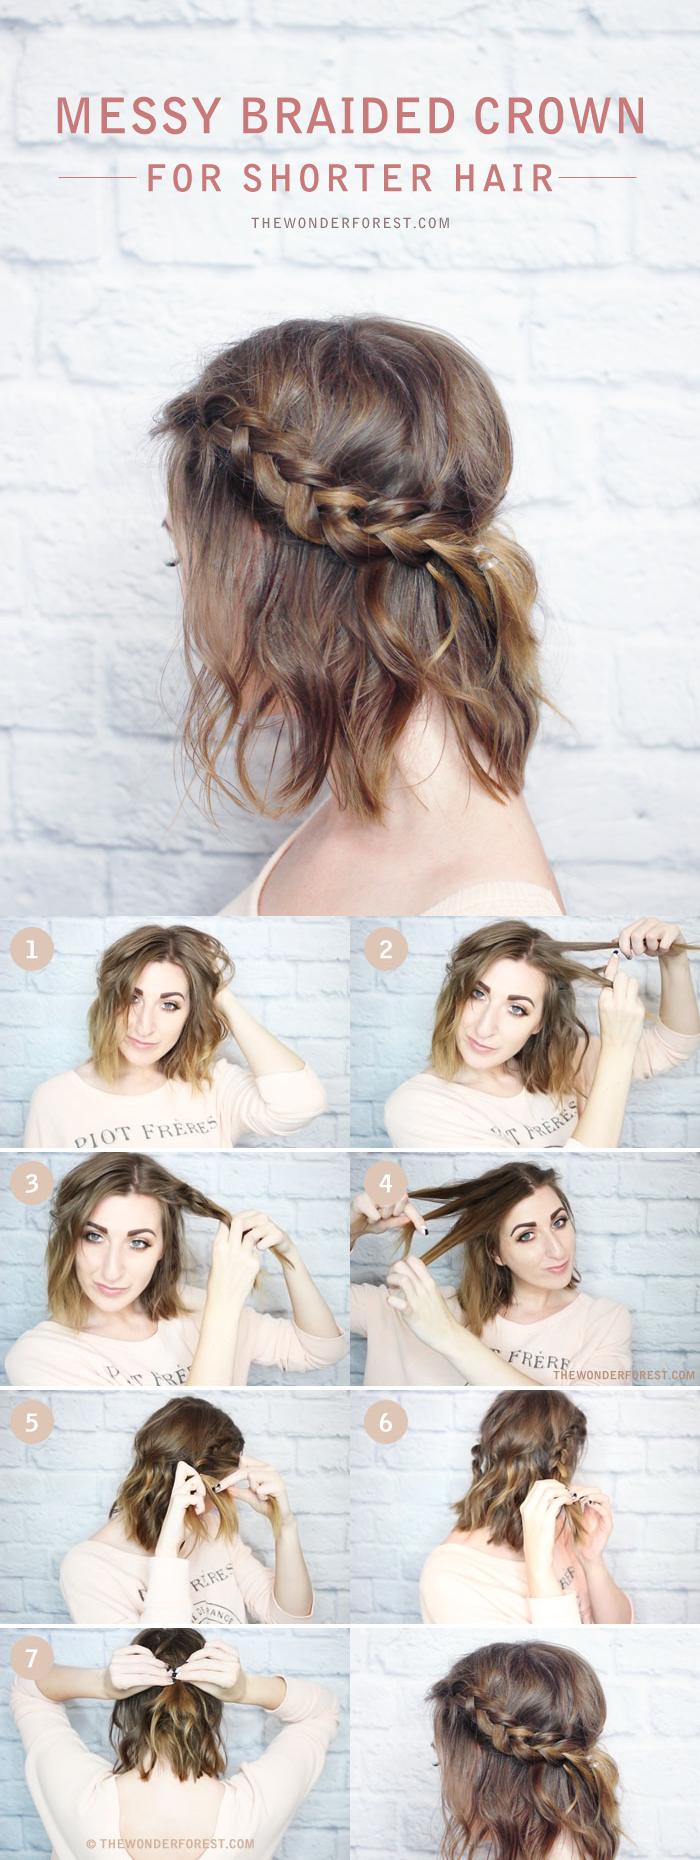 Diy hairstyles messy braided crown for shorter hair stepbystep